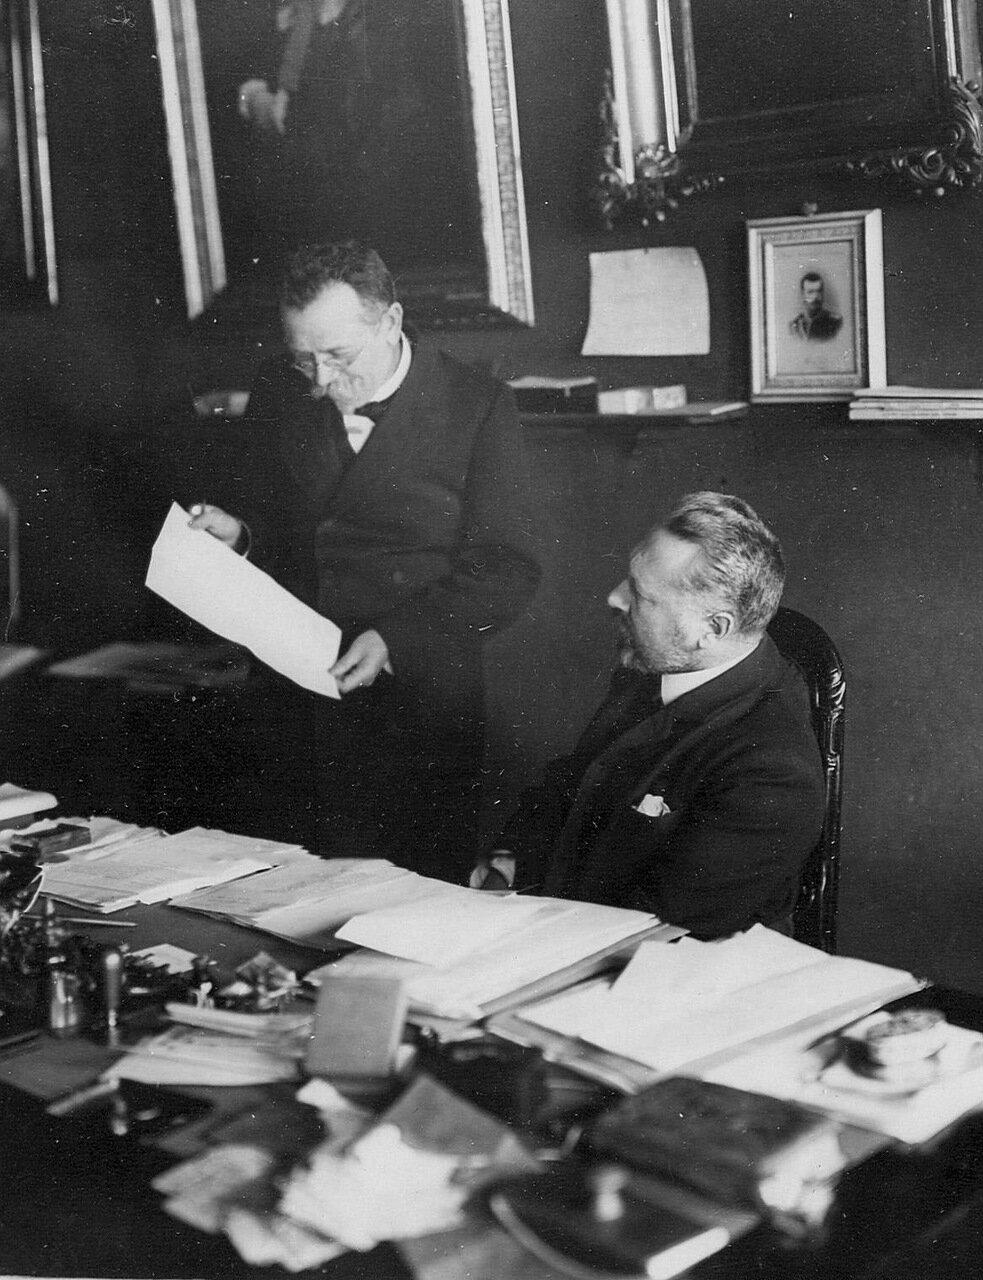 12. Сенатор Дмитрий Борисович Нейдгарт слушает доклад сотрудника о ревизии Сената. 1911